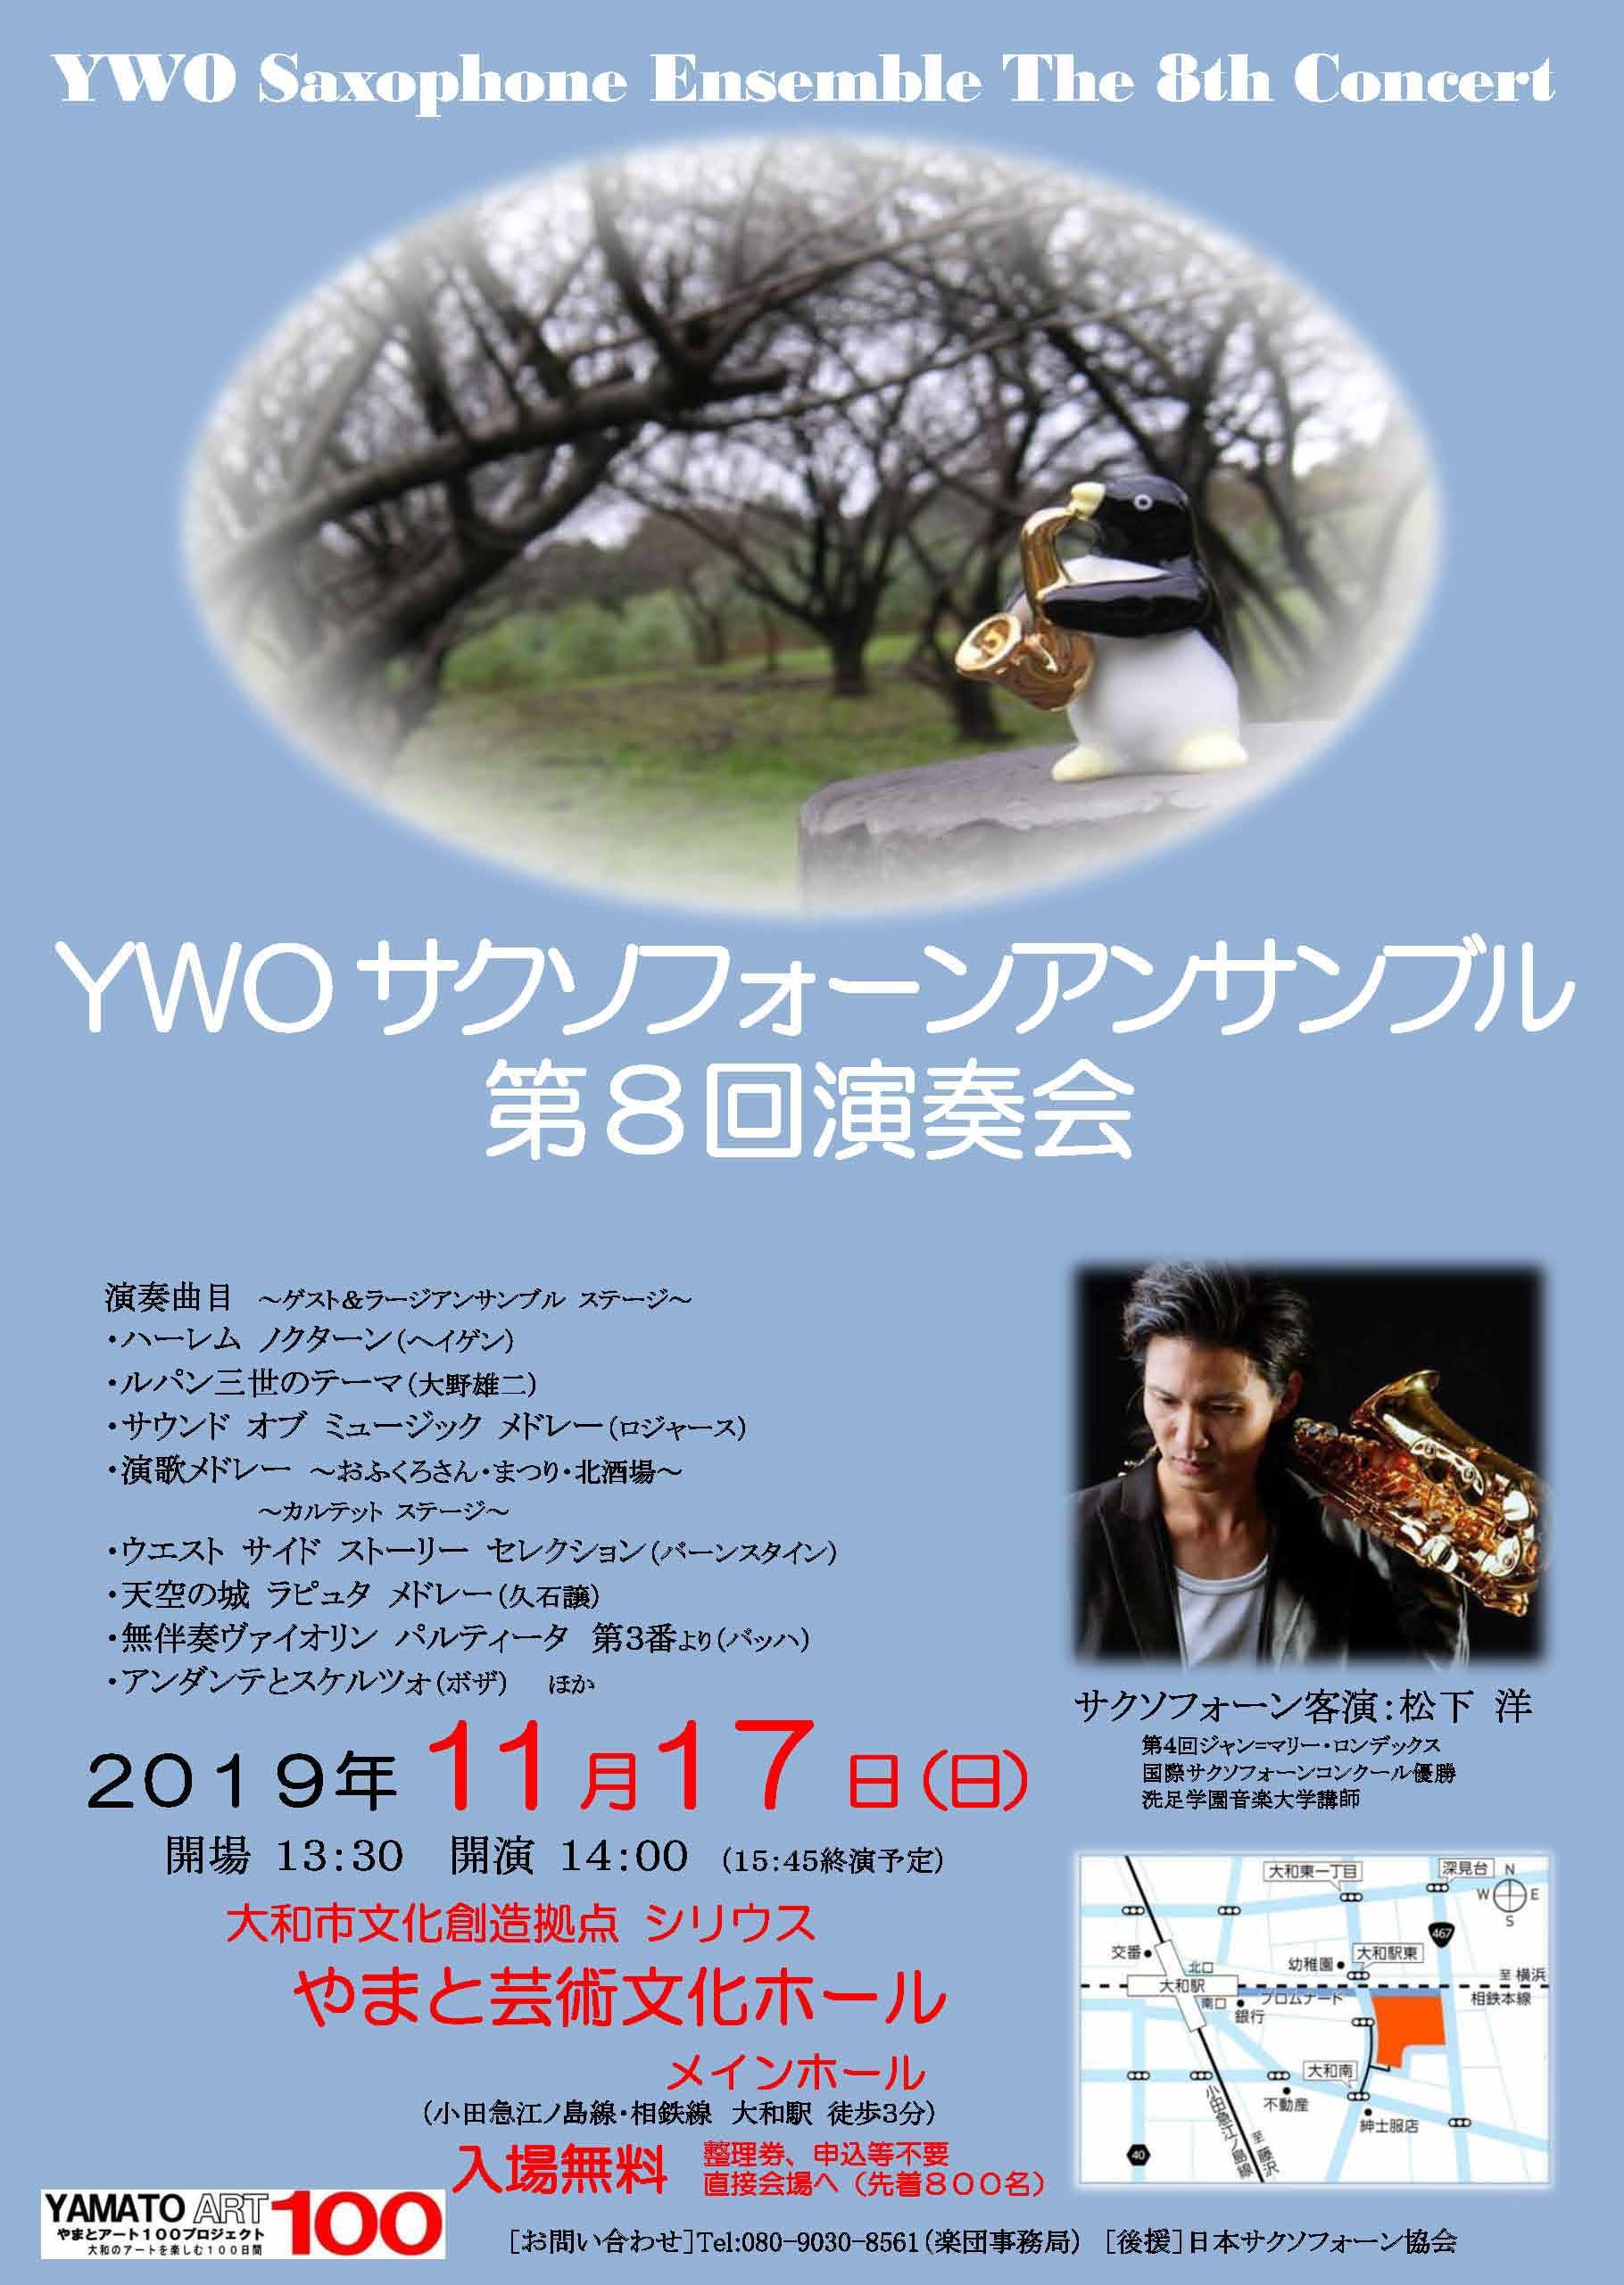 YWOサクソフォーンアンサンブル 第8回 演奏会